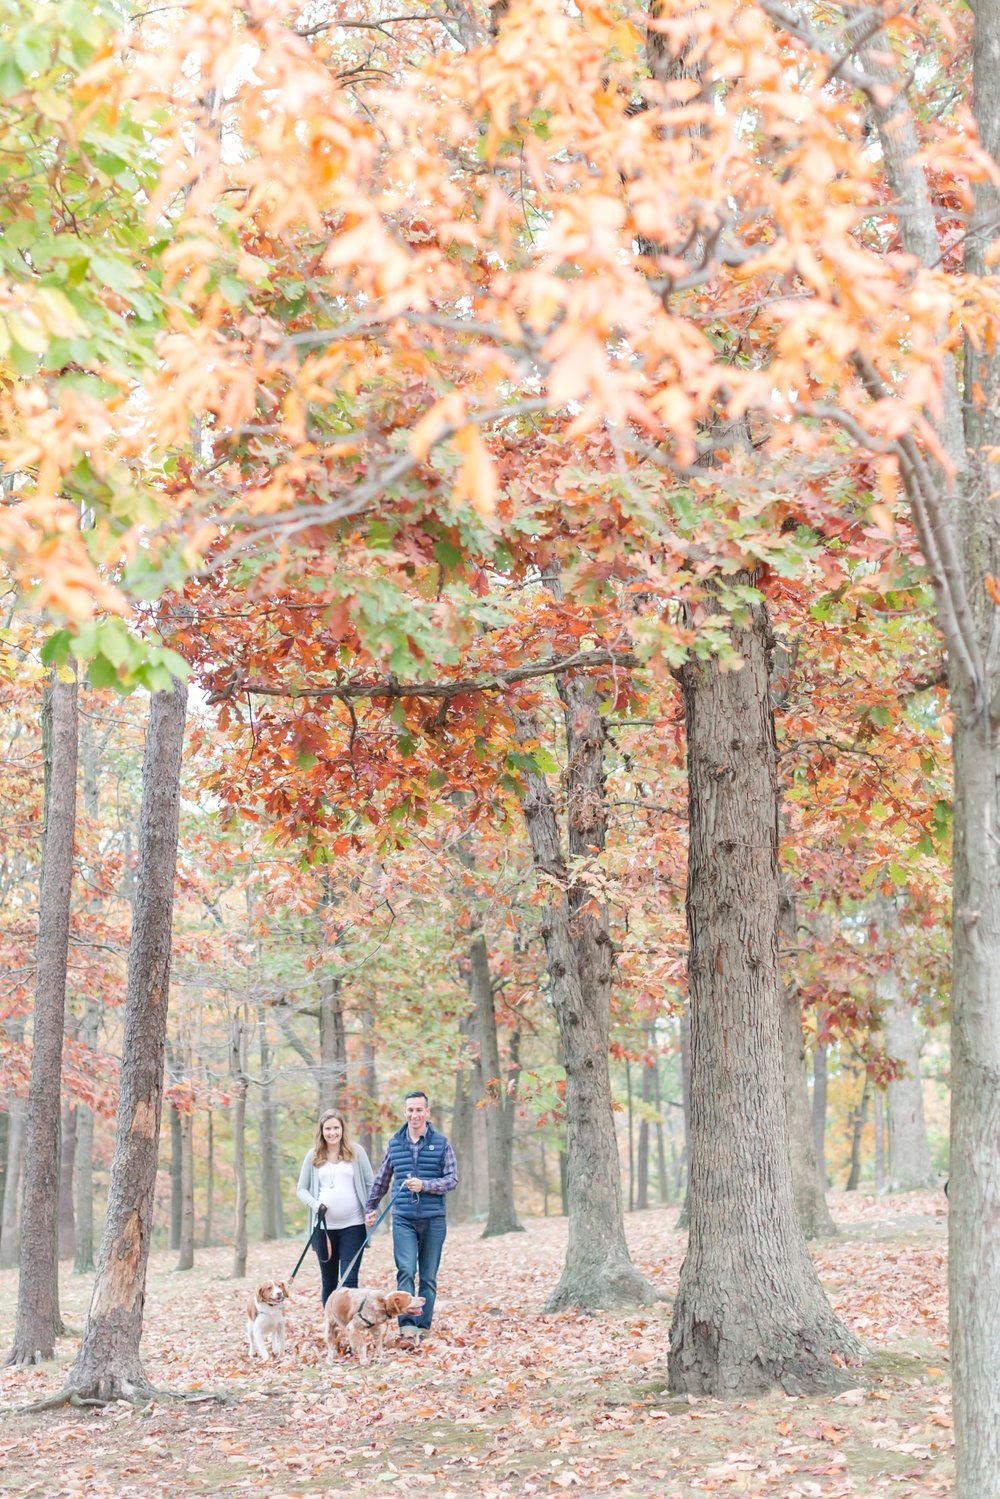 Meg and Paul Maternity-305_dc-arboretum-virginia-maternity-photography-anna-grace-photography-photo.jpg